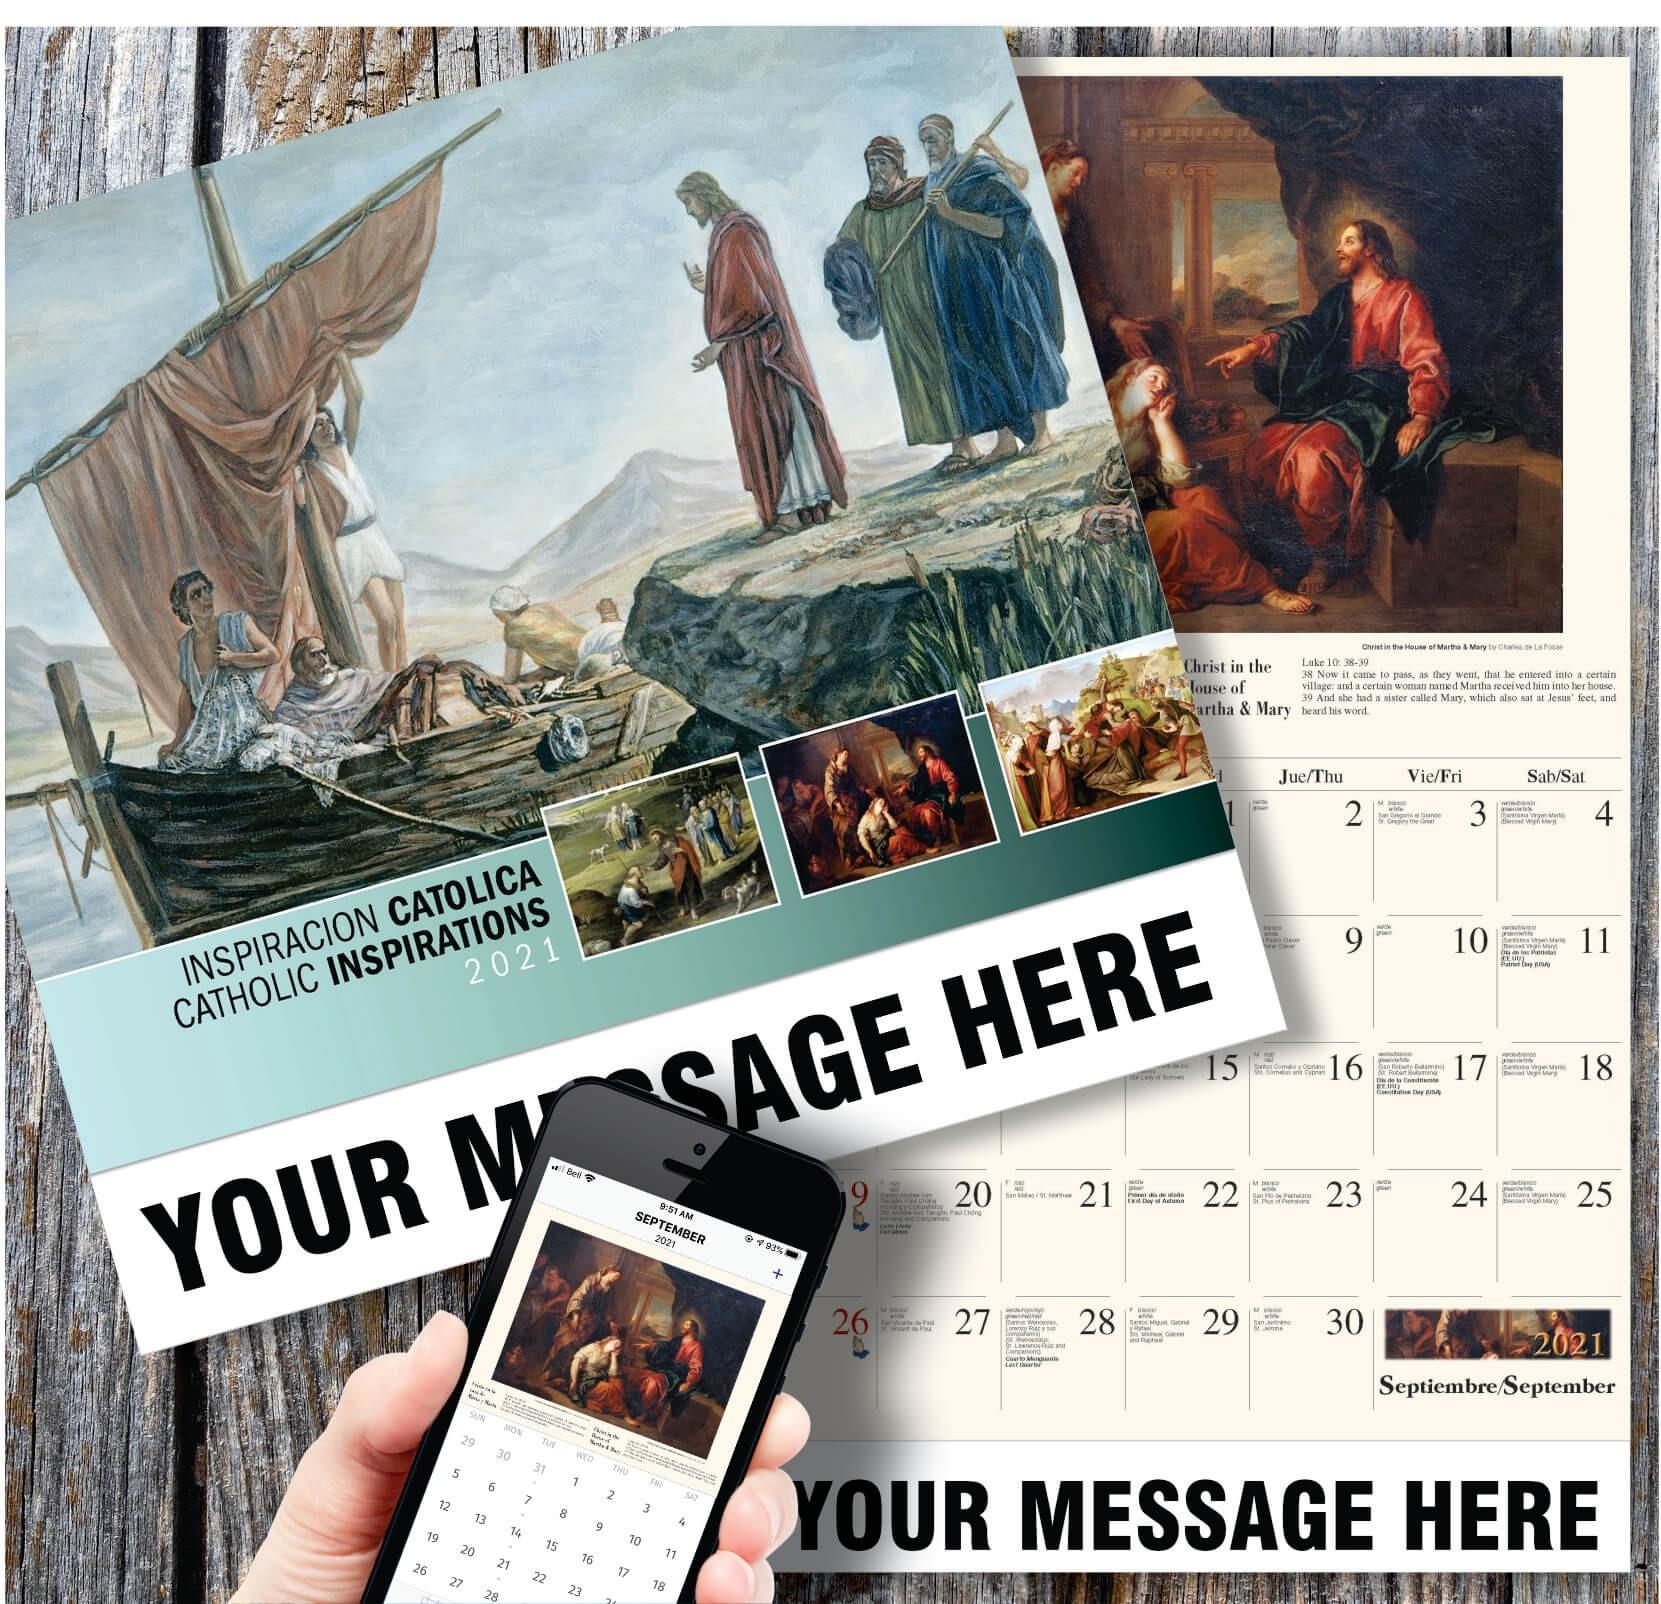 Liturgical Calendar 2021 - Catholic Inspiration (Spanish  Liturgical Calendar 2021 Umc